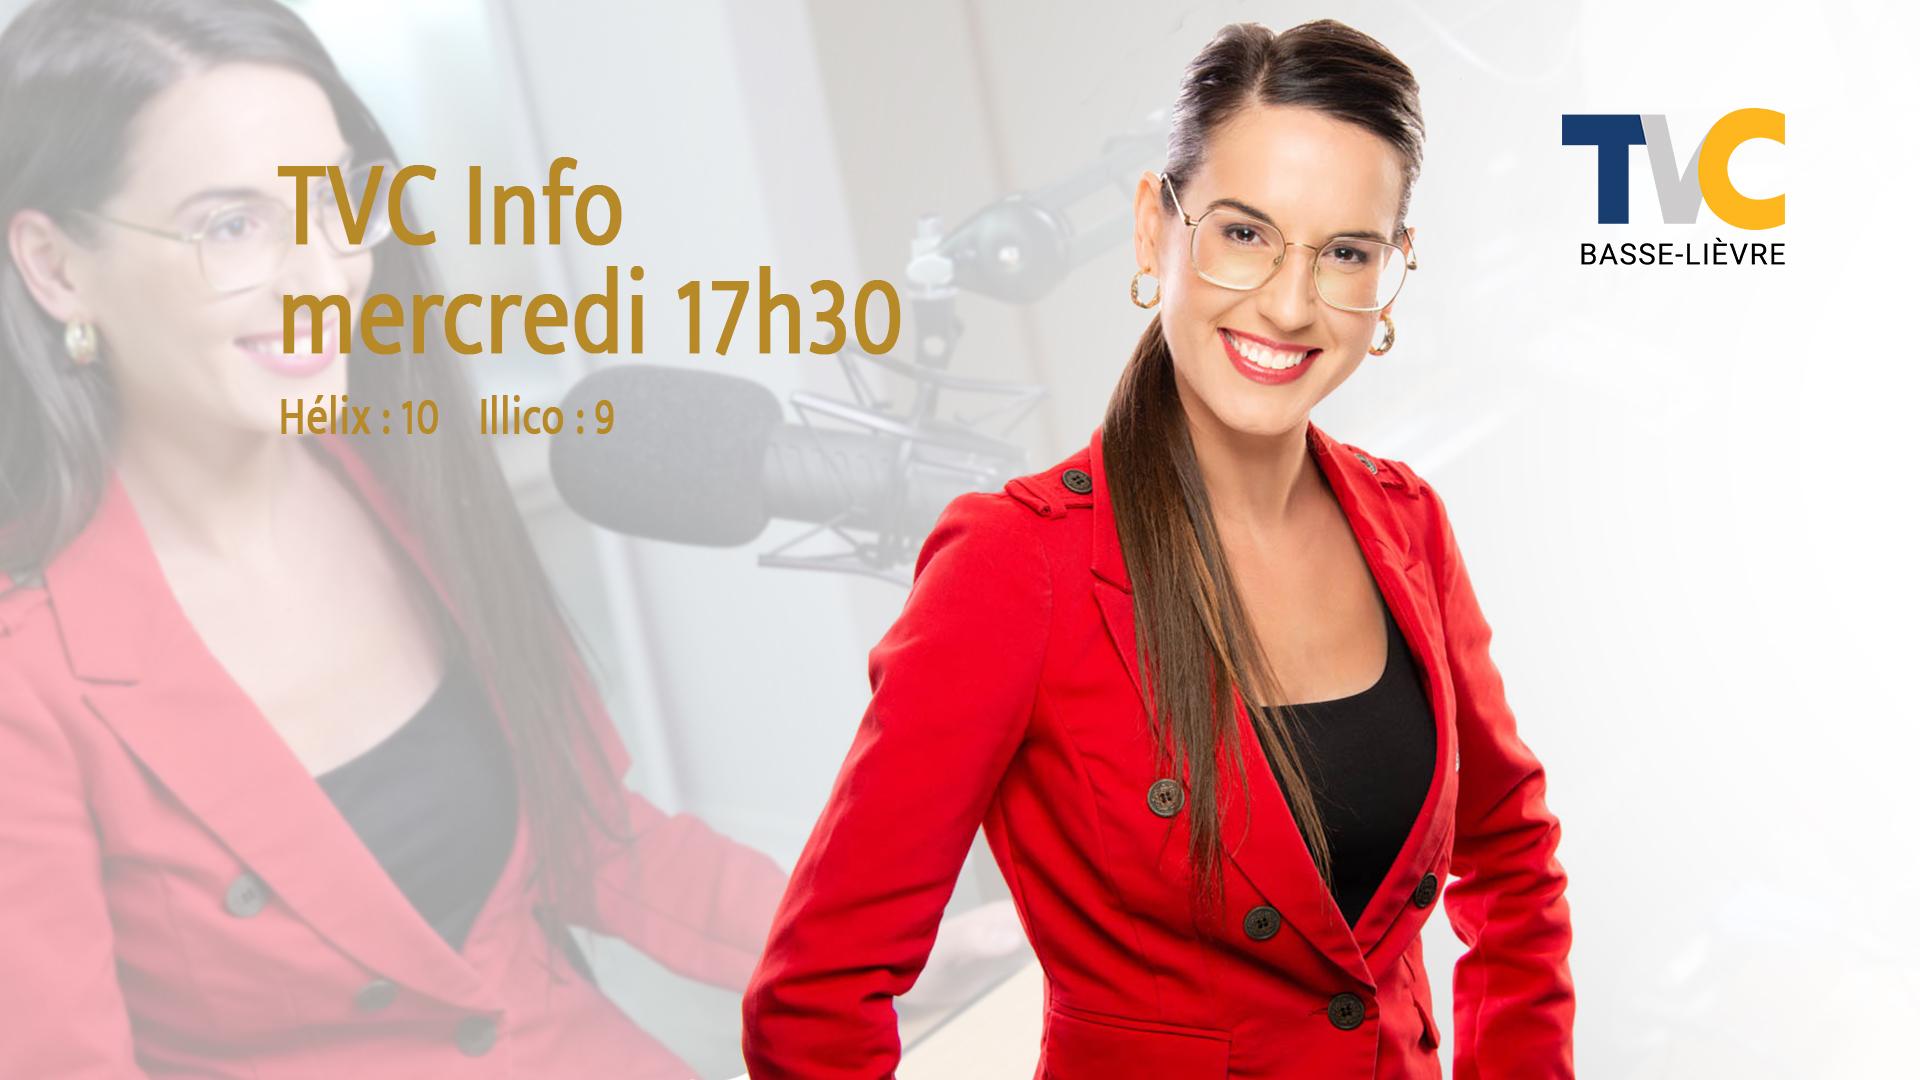 Promo TVC Info